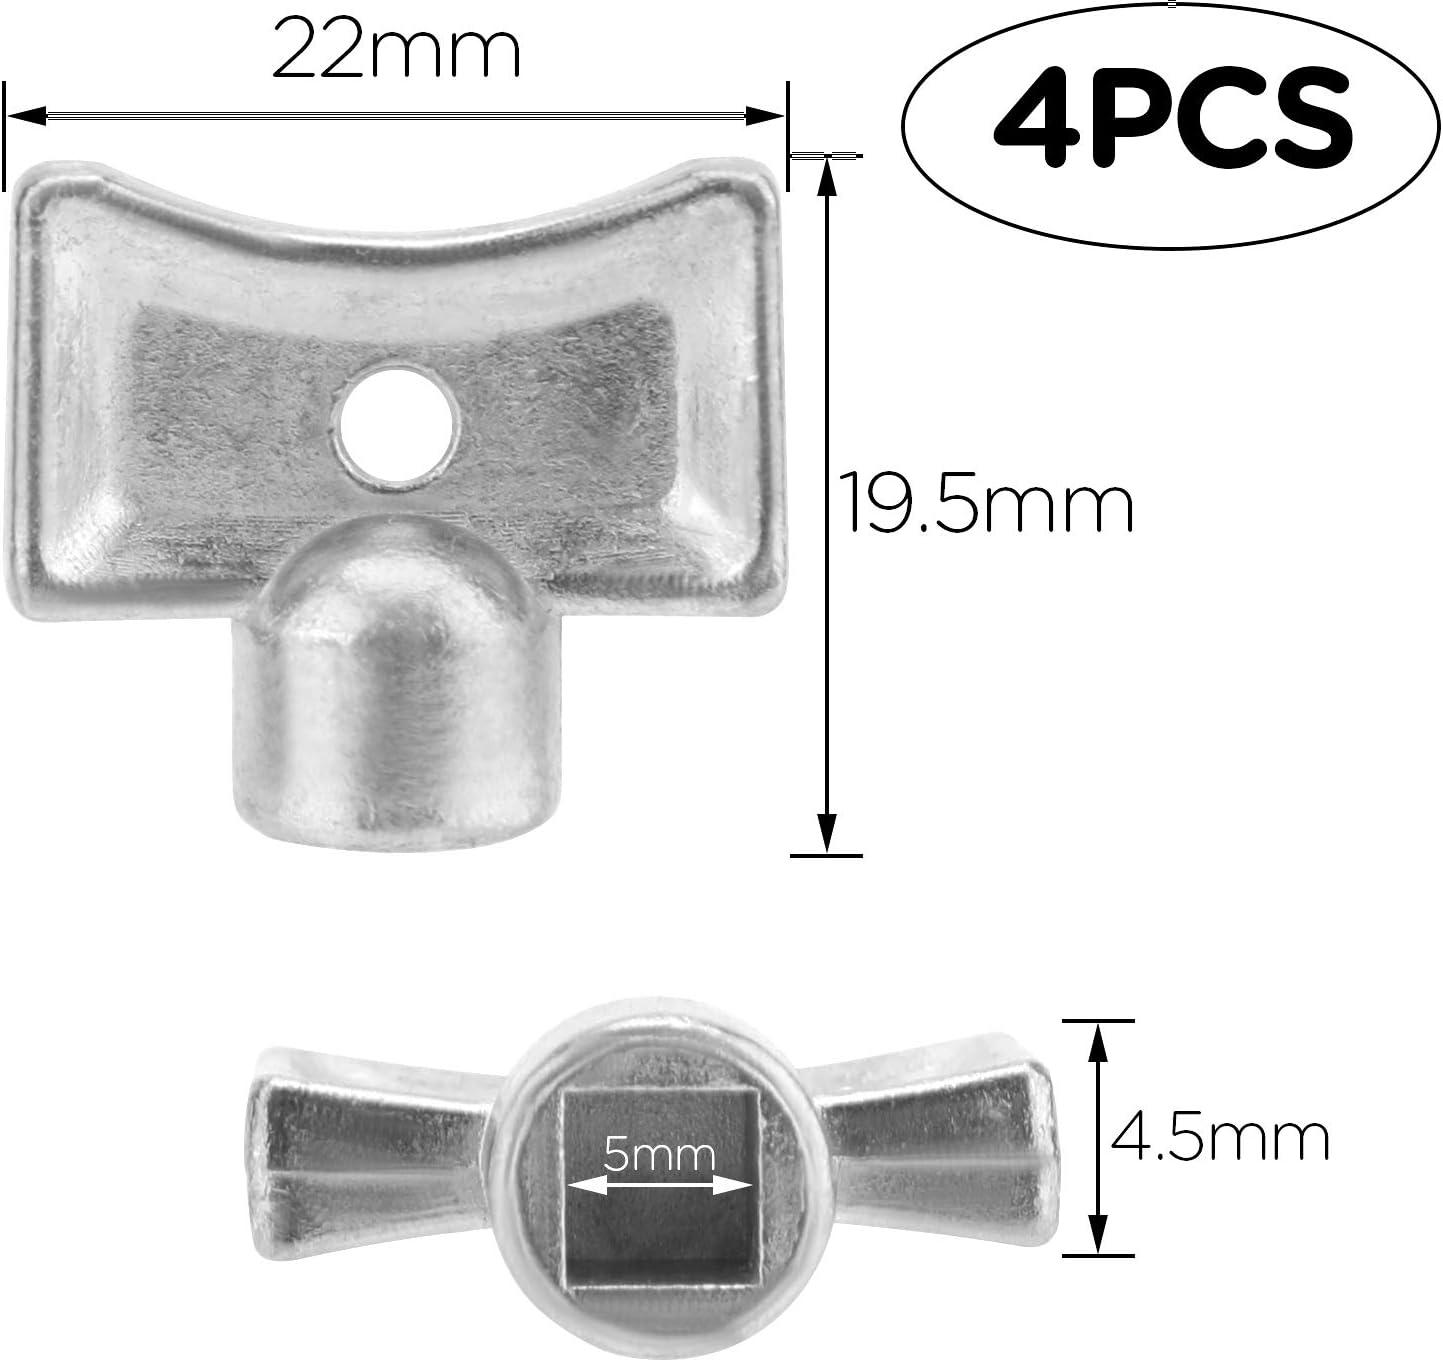 LUTER 4Pcs Radiator Valve Keys Silver Radiator Bleed Hole Key Radiator Vent Air Valve Key Plumbing Valve Key for Radiators and Faucet